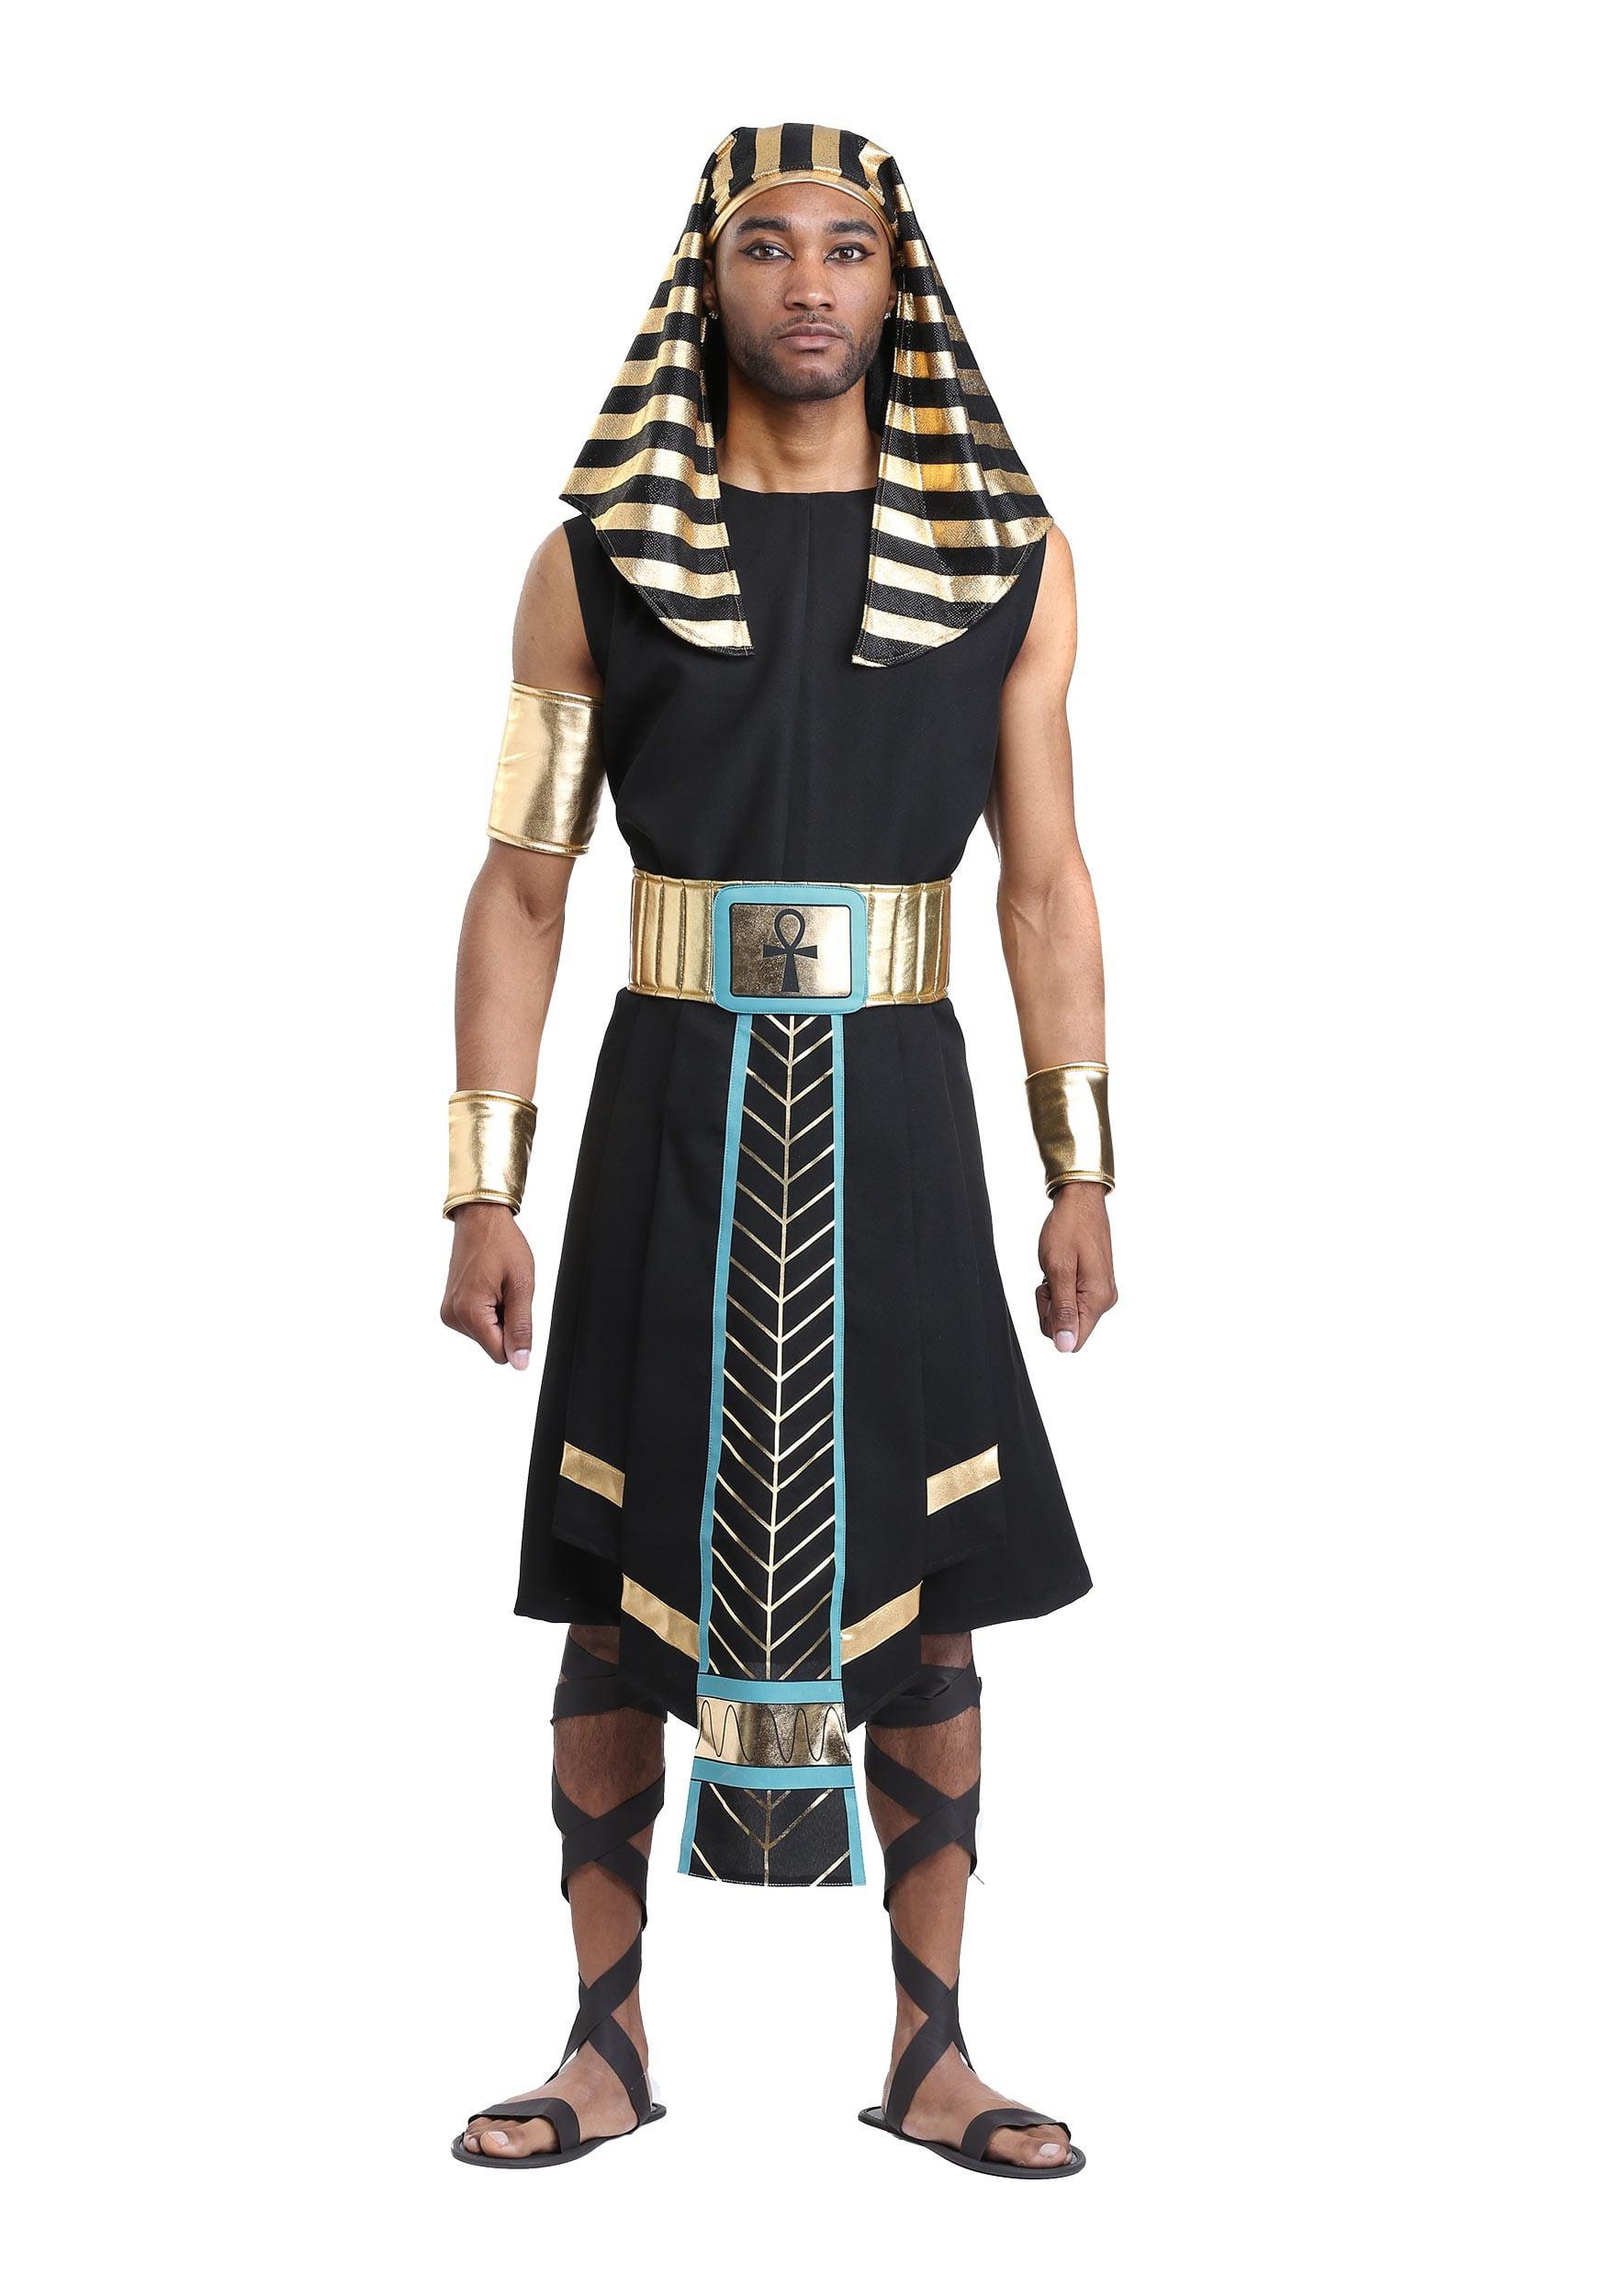 Pharaoh Deluxe Men Egyptian Costume by California King Royal New Tunic Headpiece